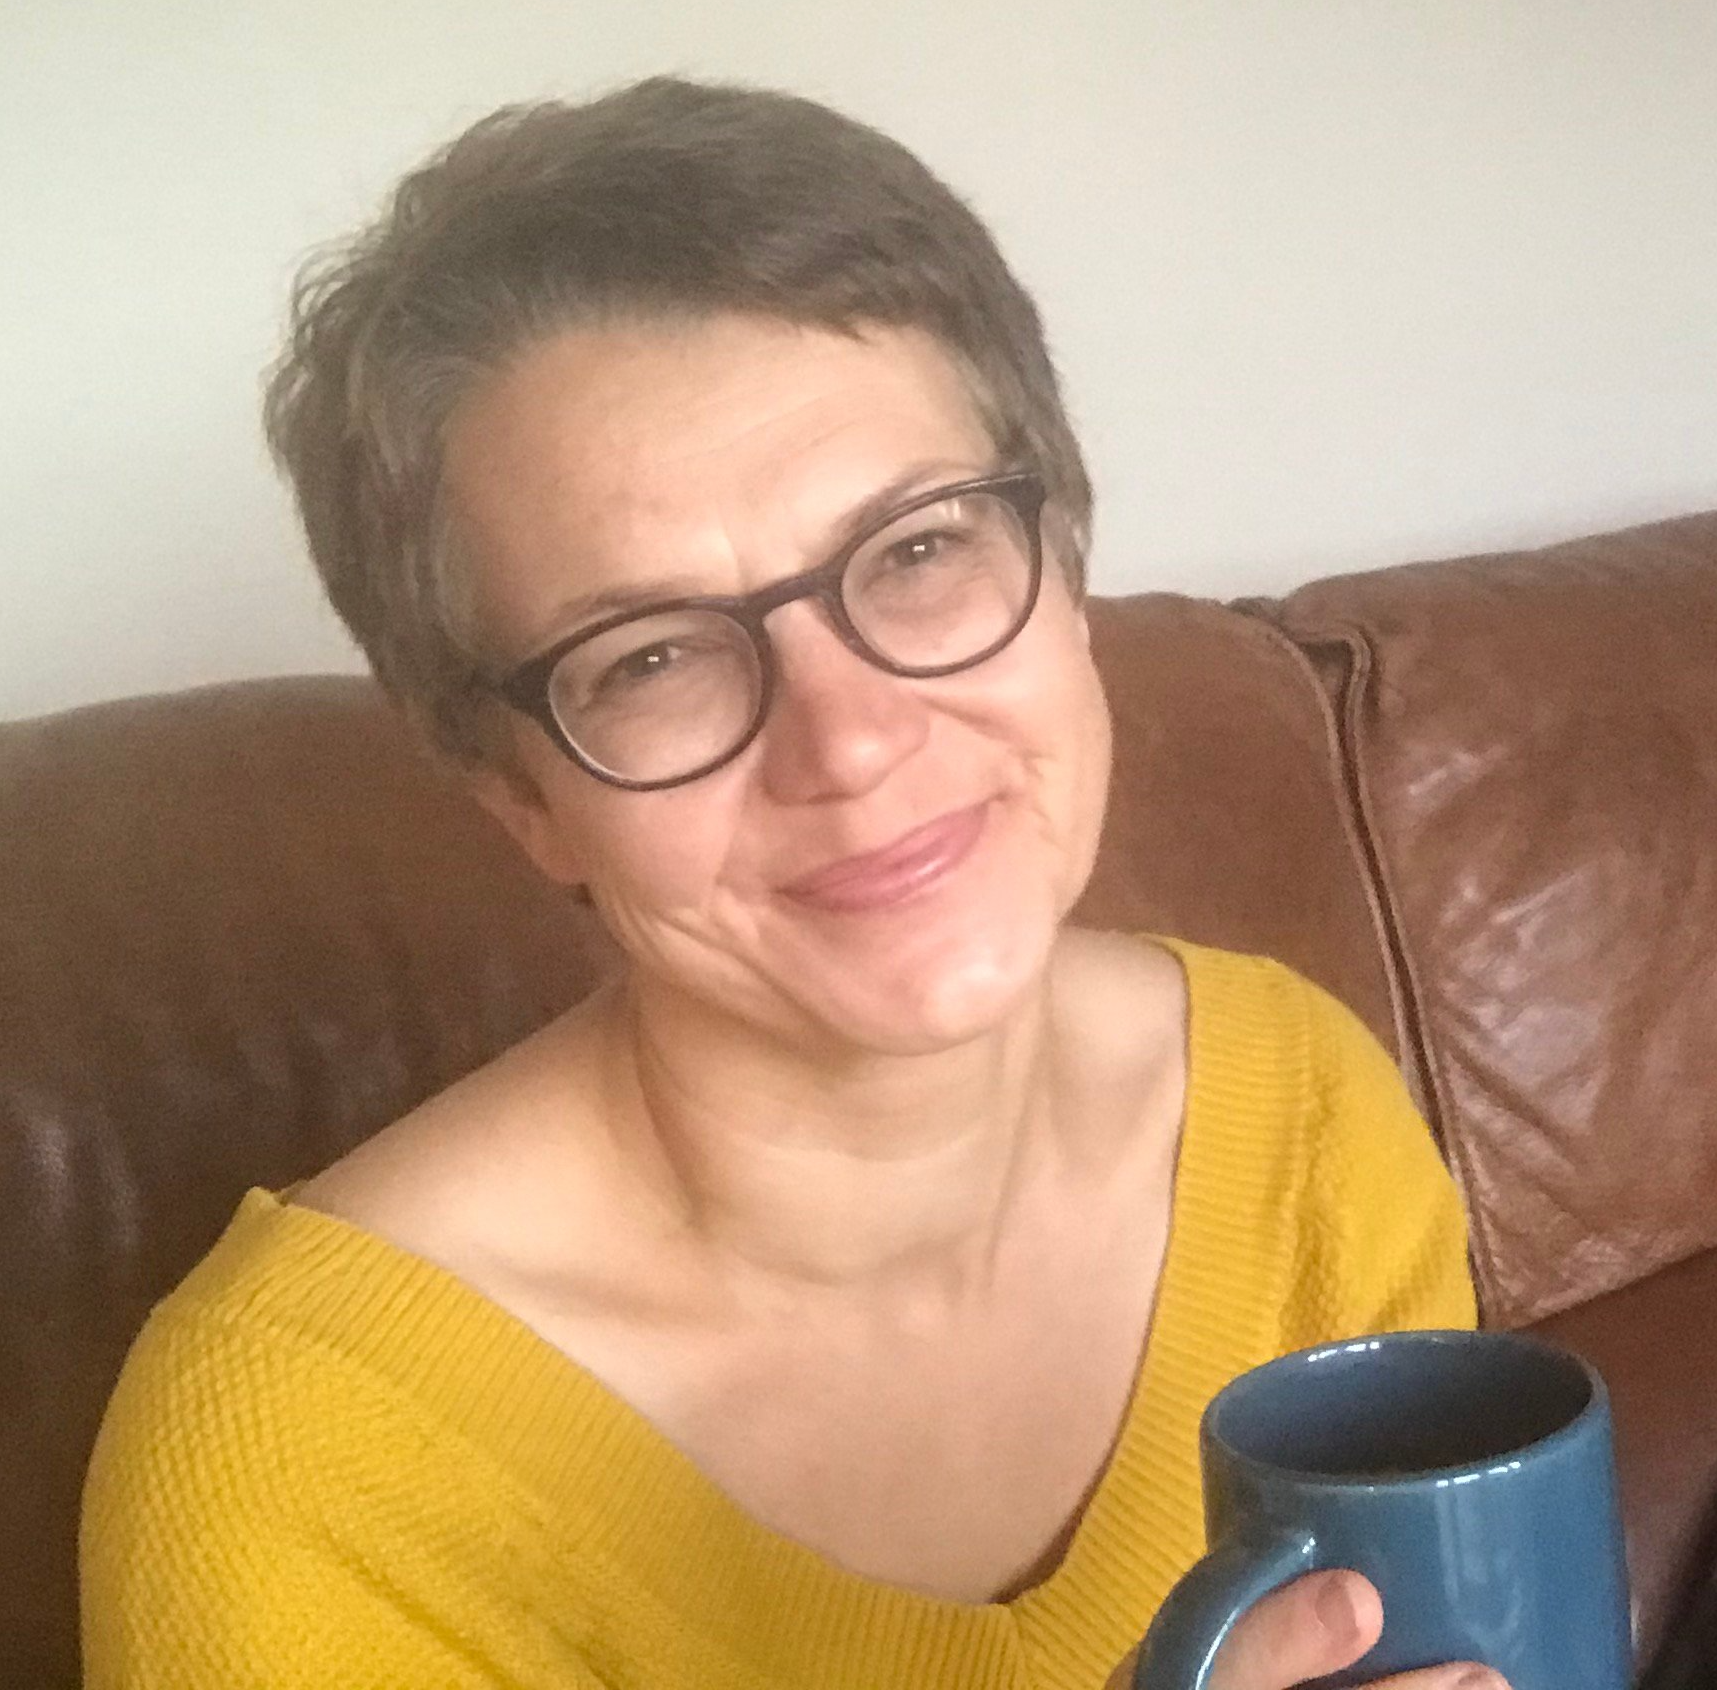 Karine with mug of tea